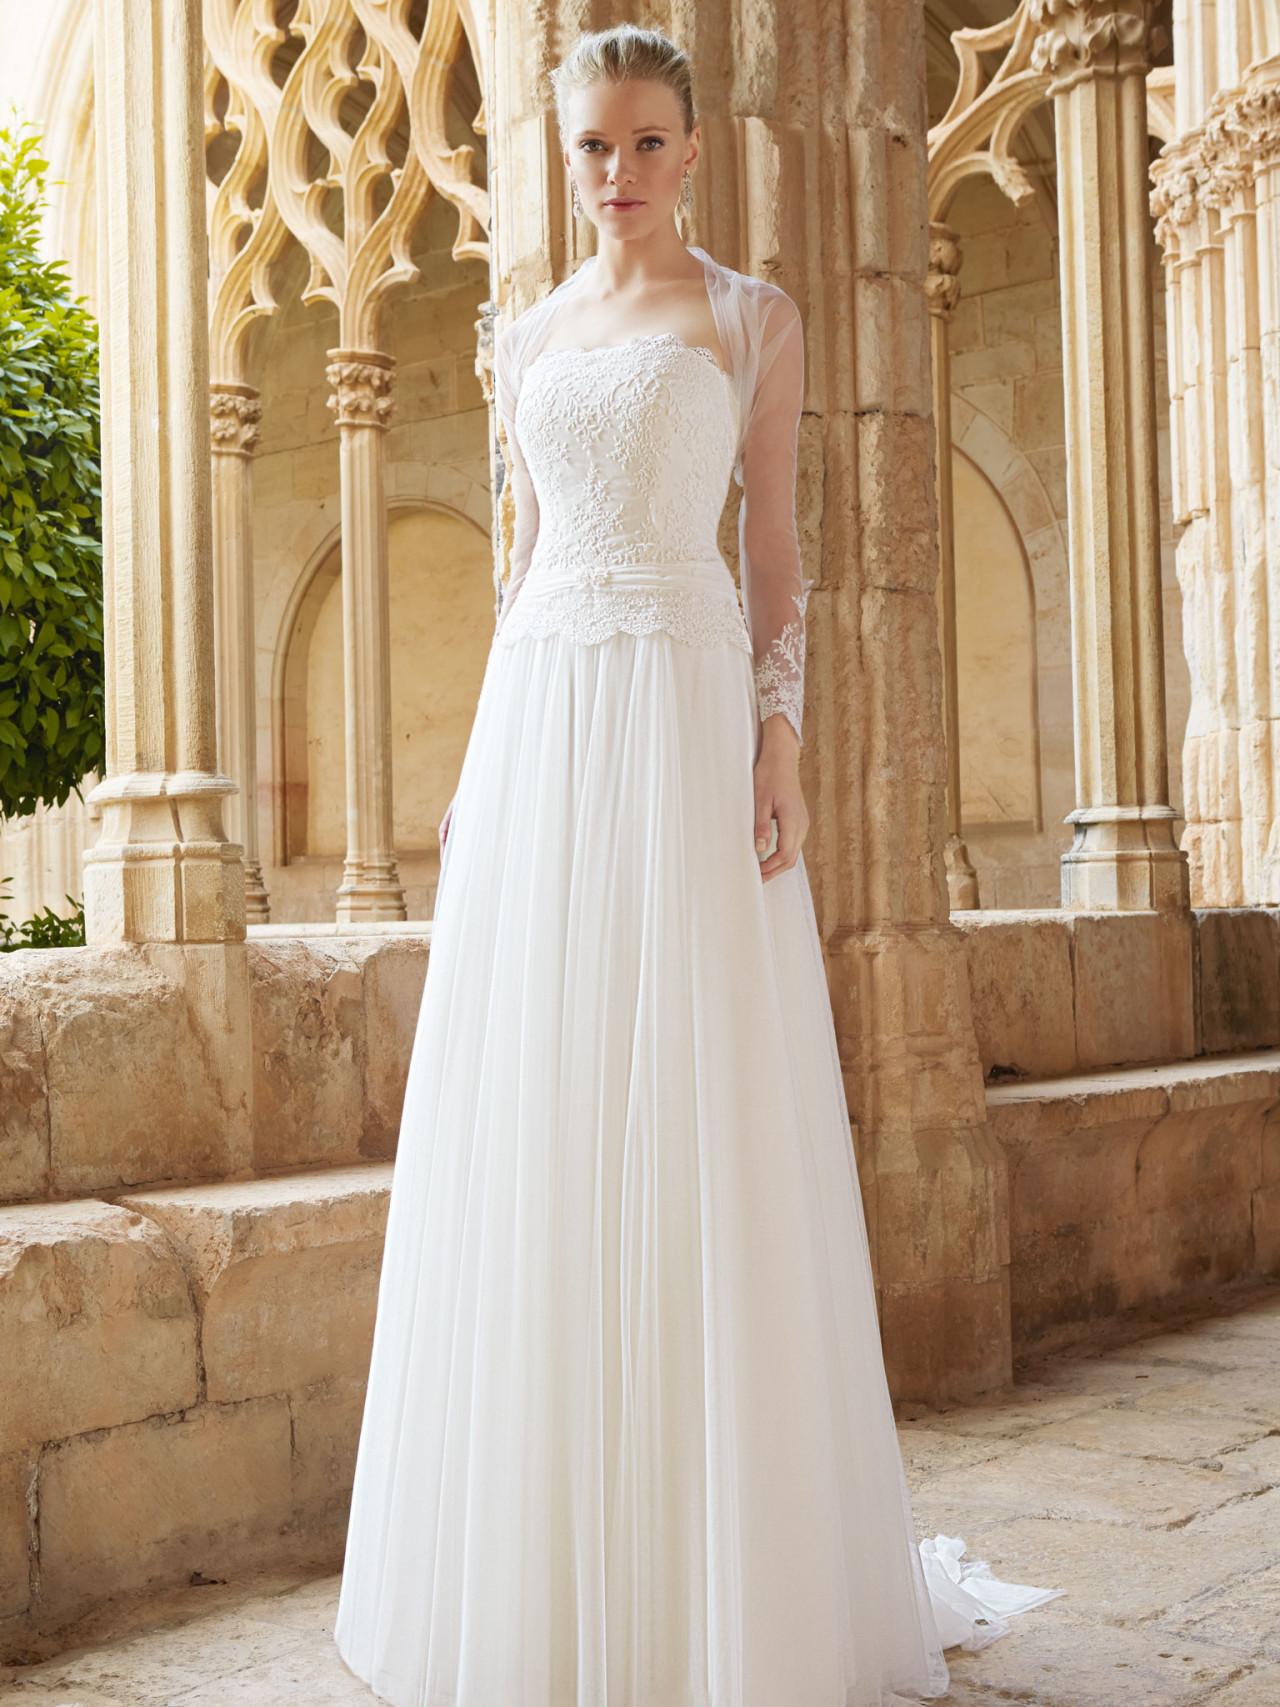 blonde brudekjole med ærmer